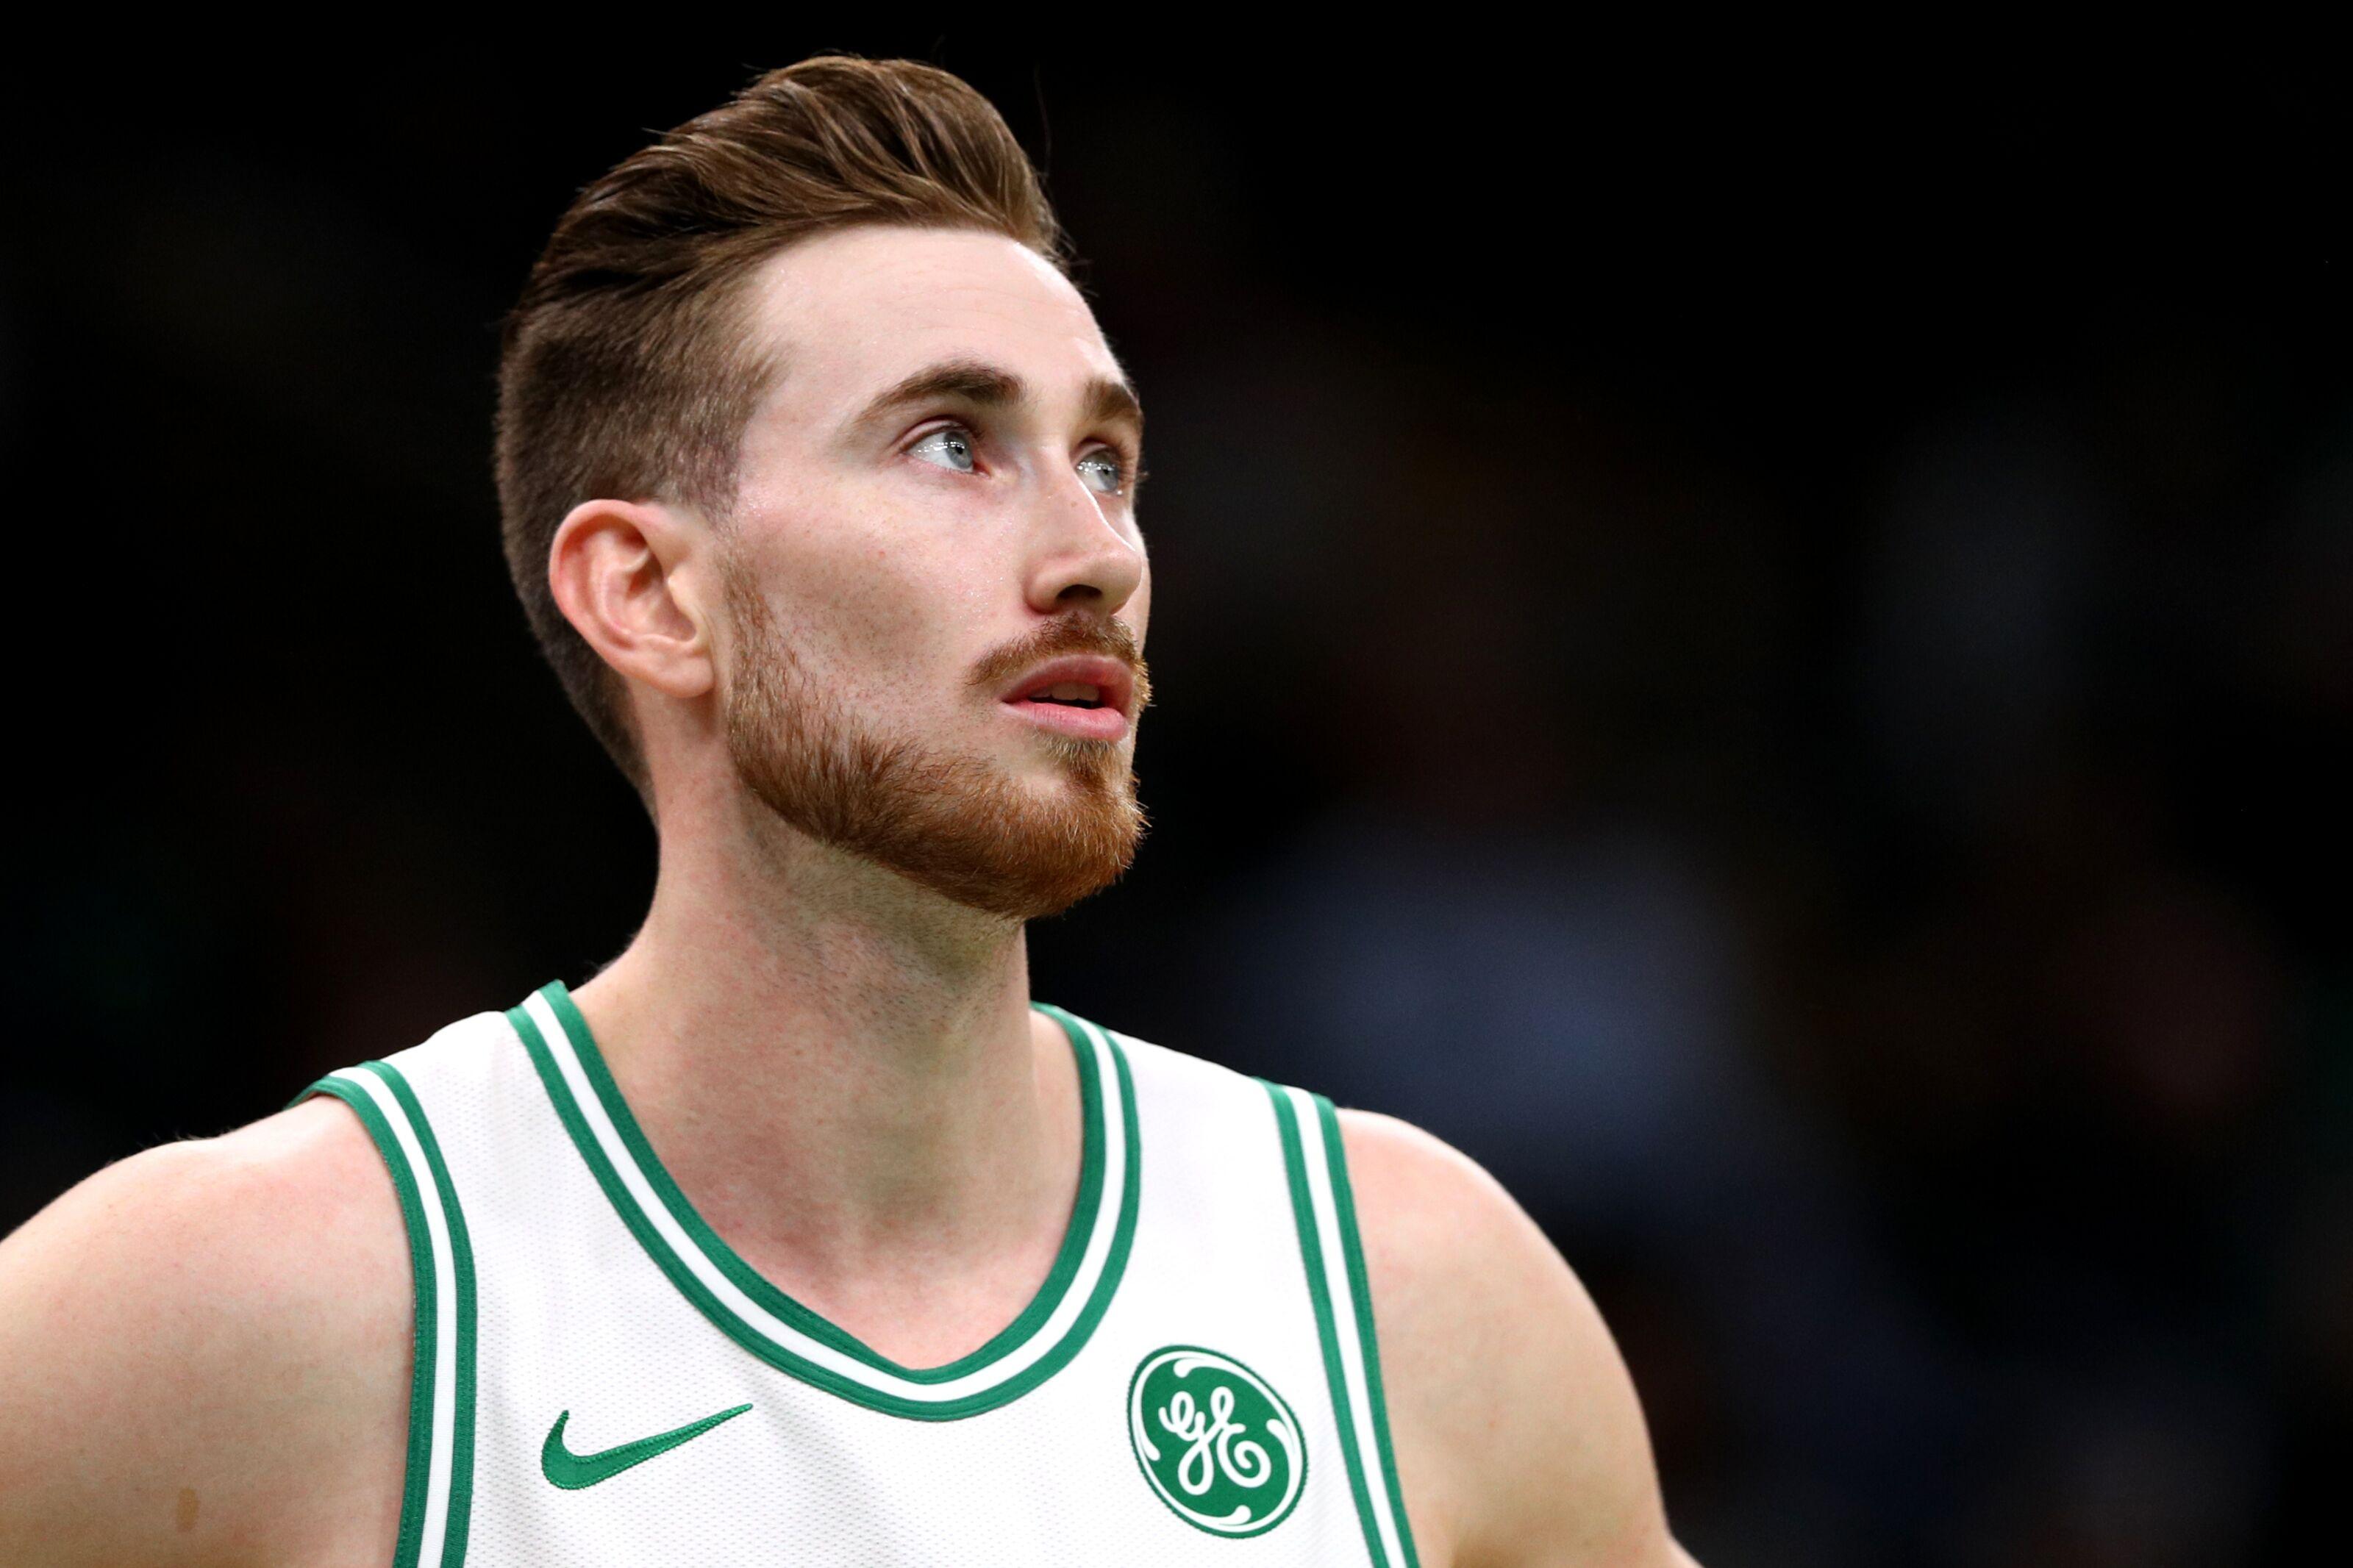 Boston Celtics: Gordon Hayward continues his struggles in